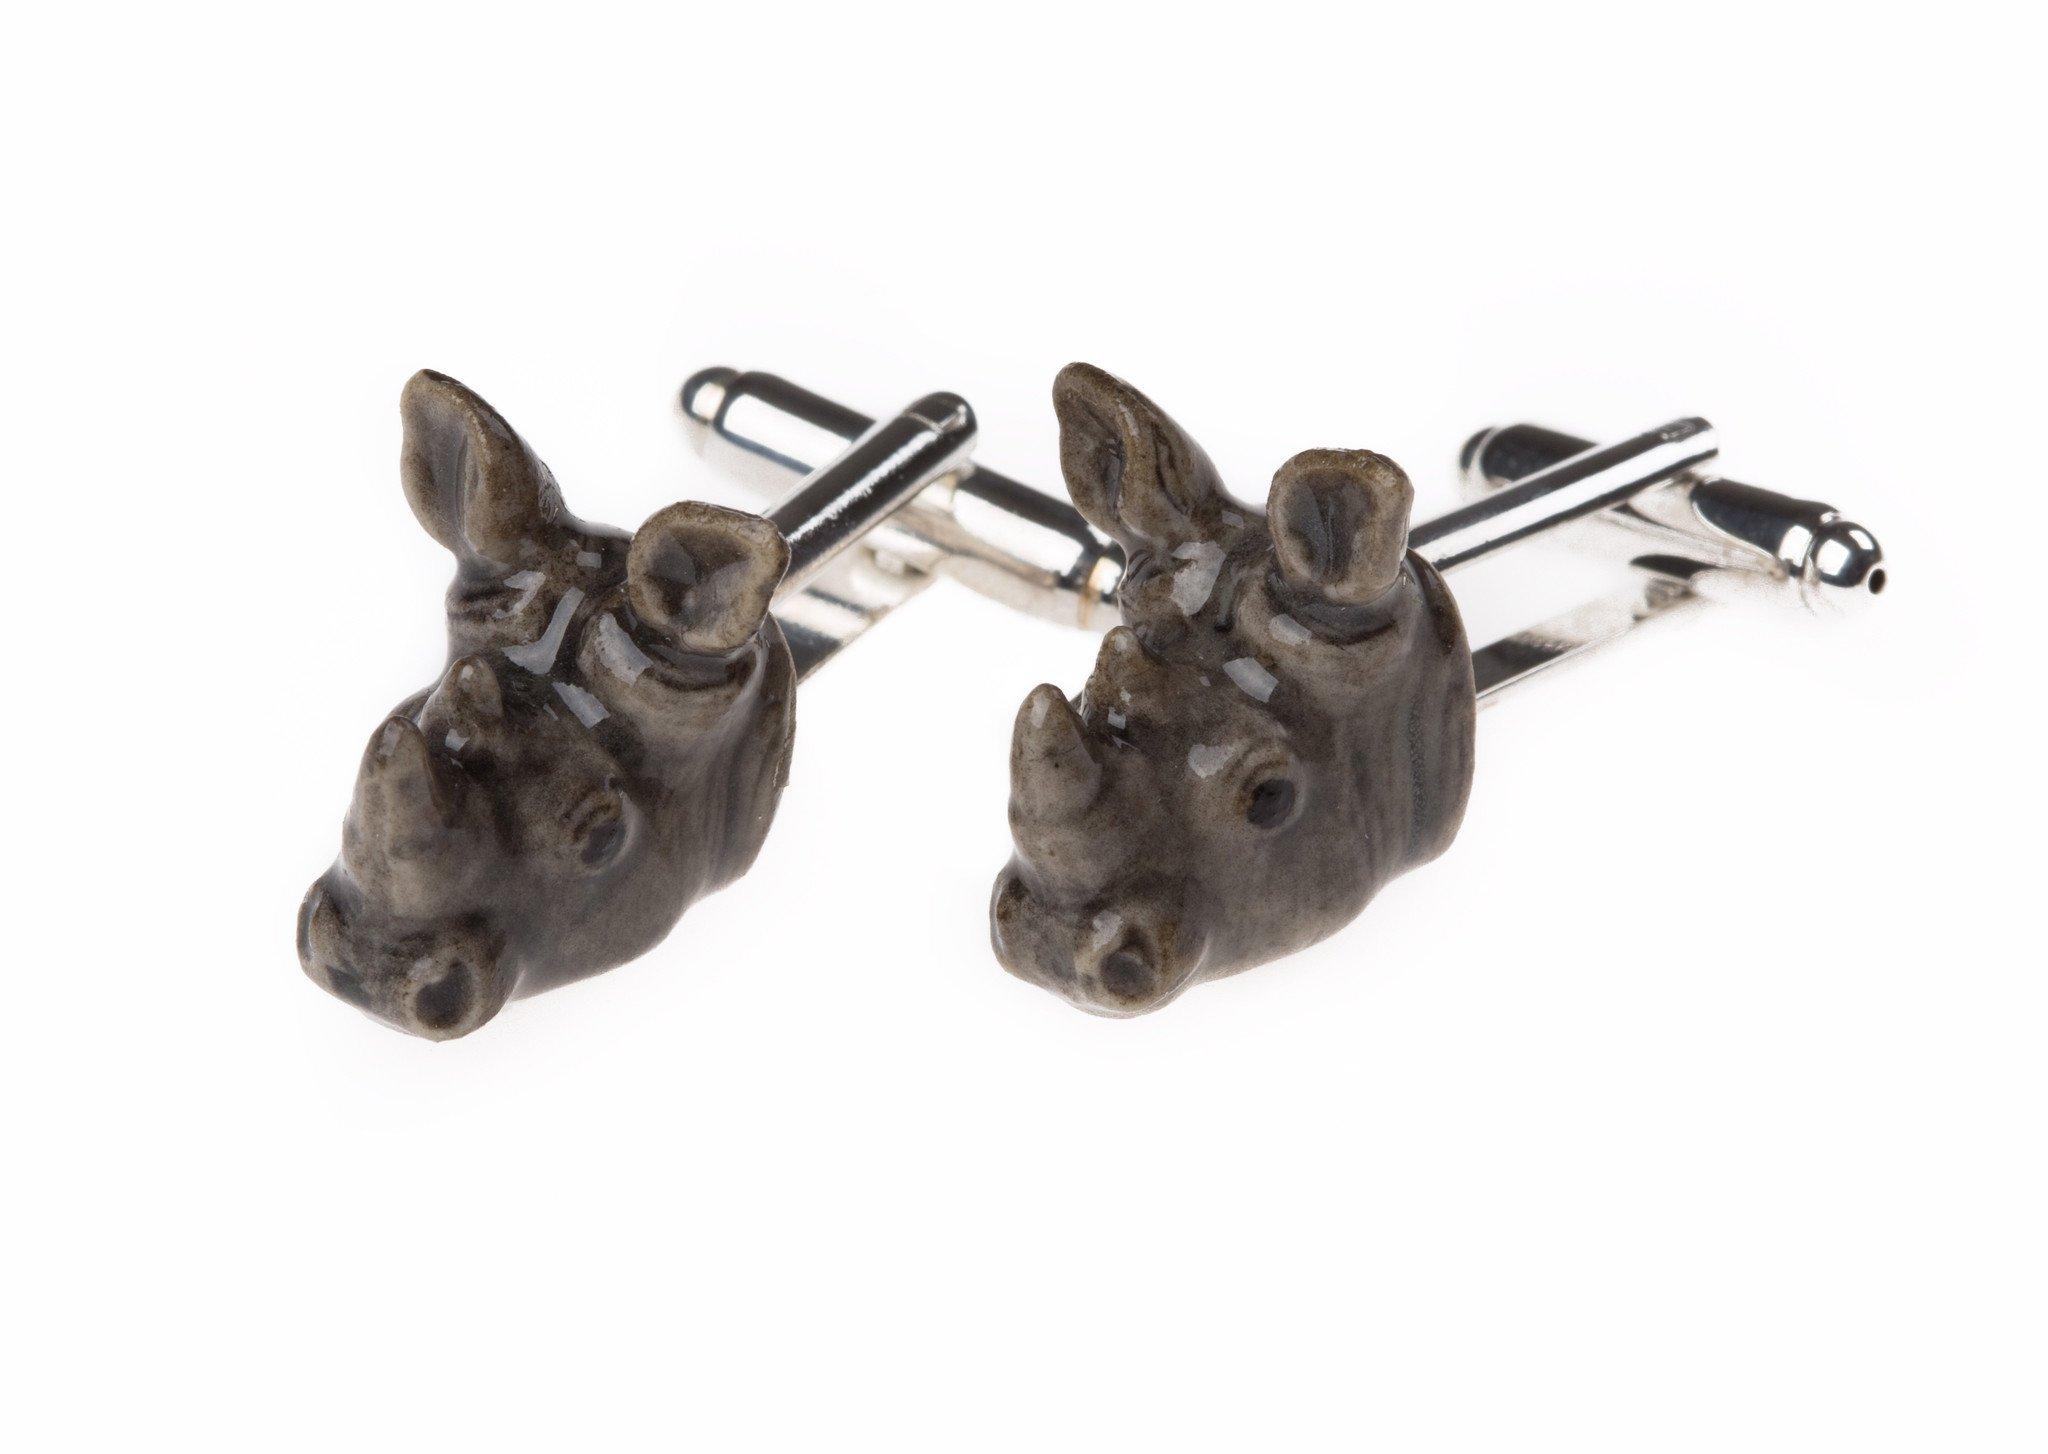 Rhino Cufflinks £35